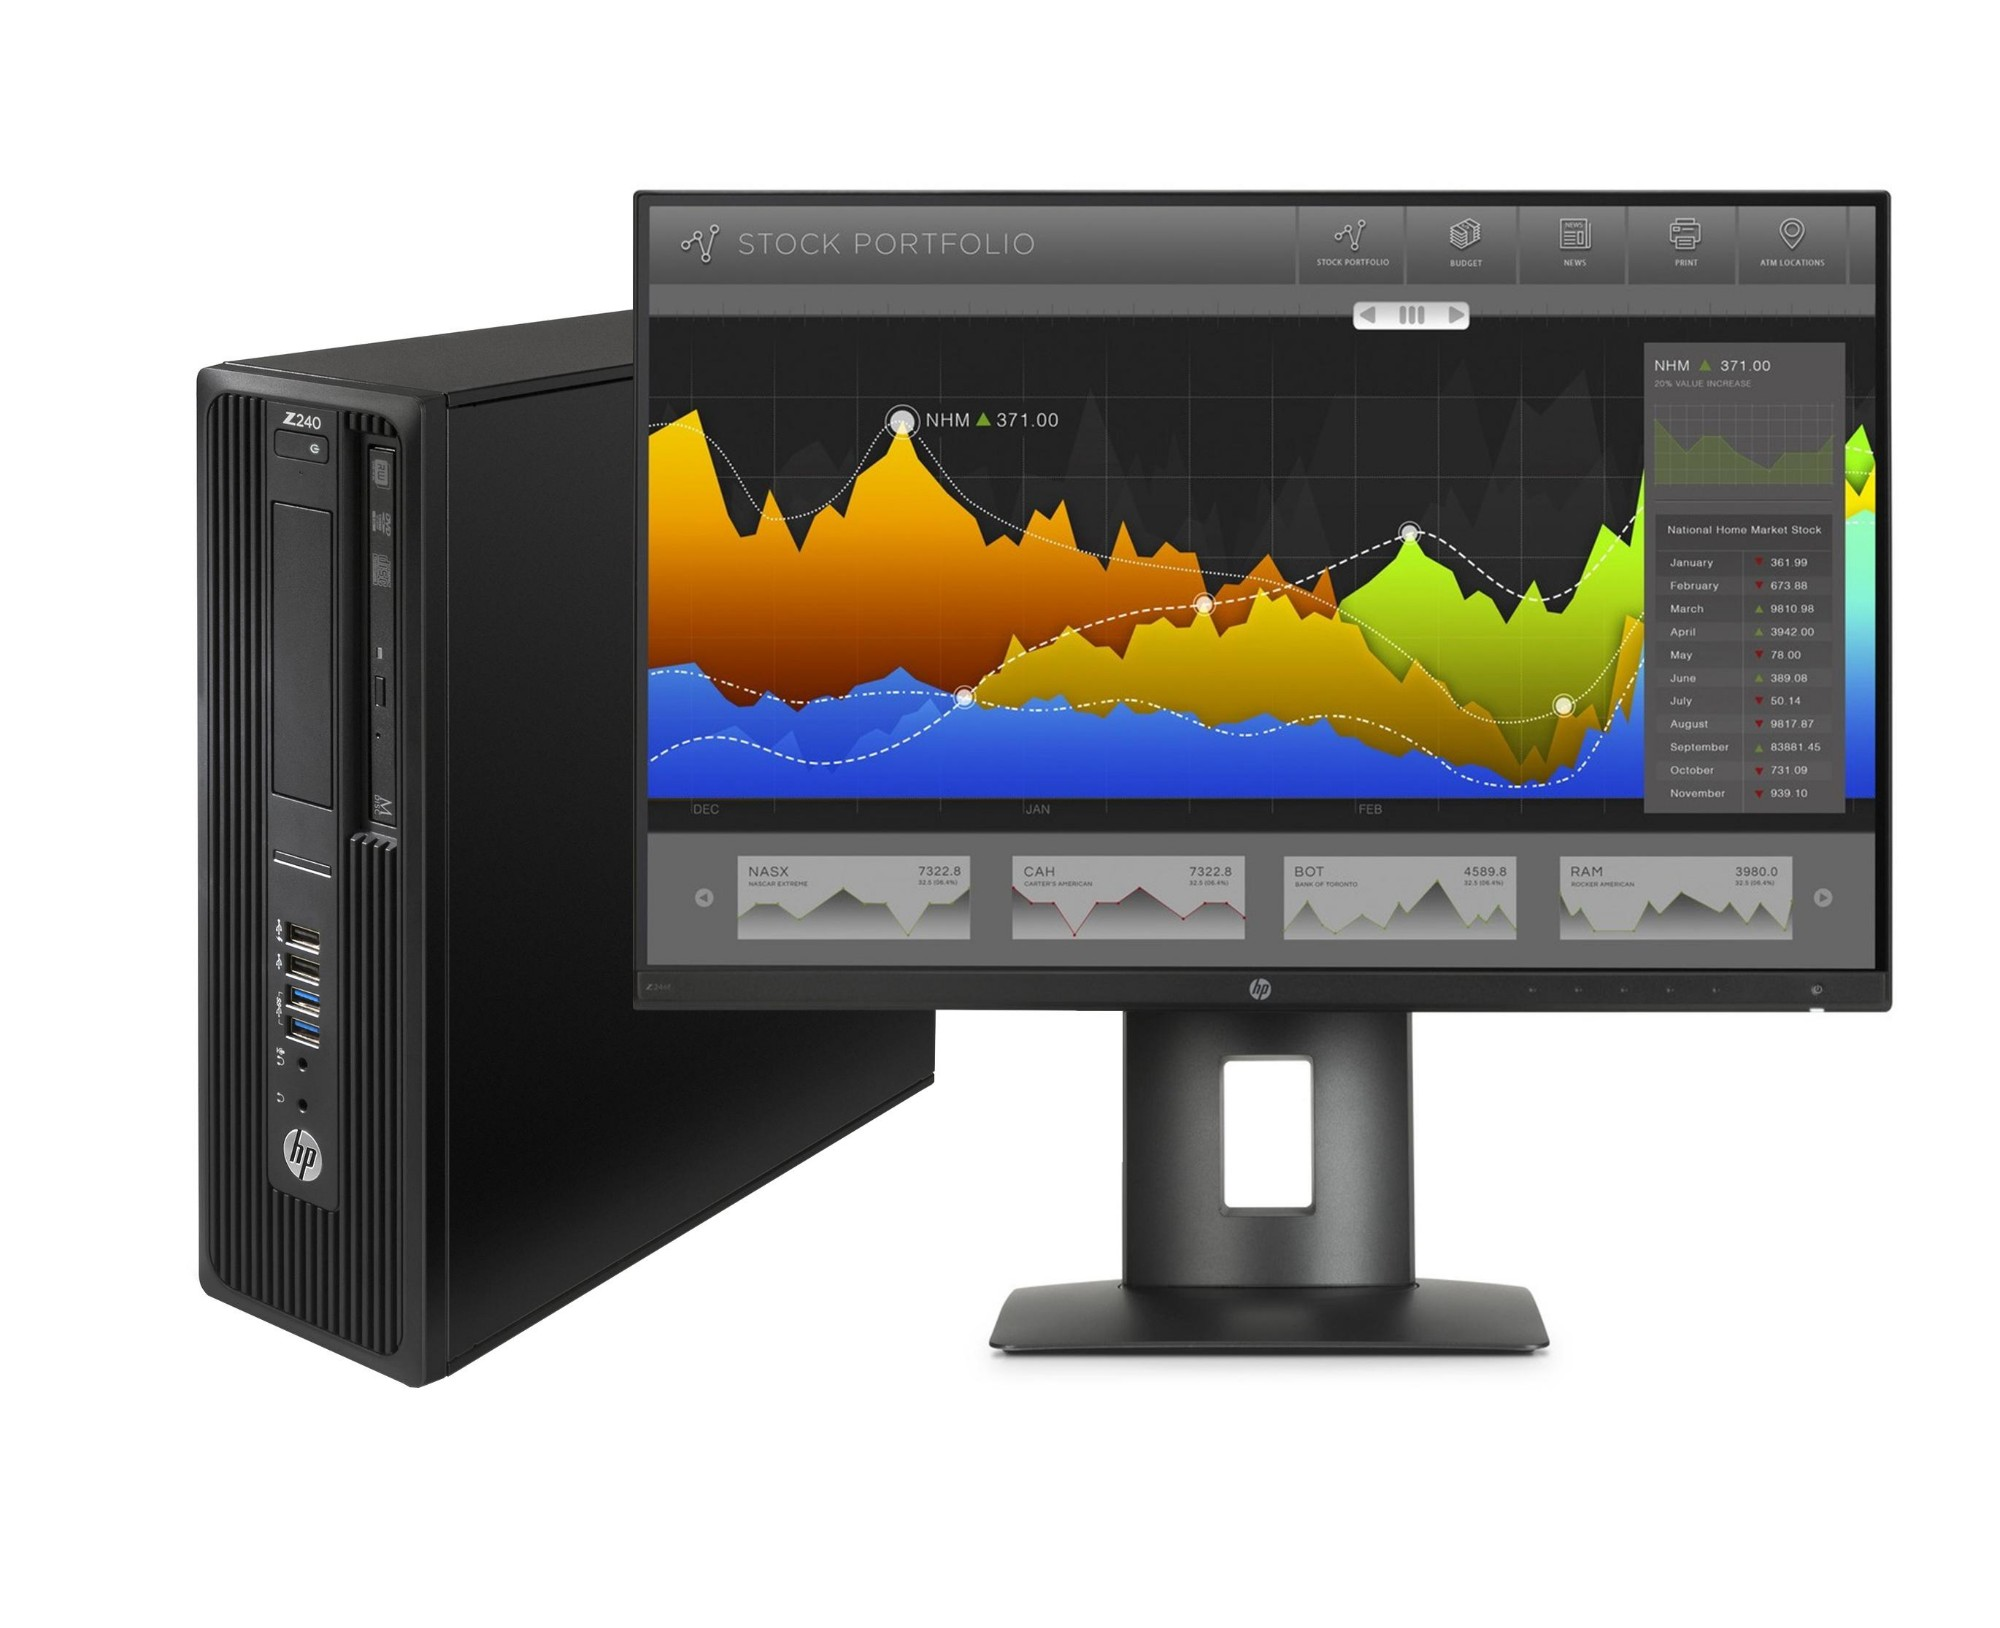 HP 240 SFF + Z24nf 3.4GHz i7-6700 SFF Black Workstation